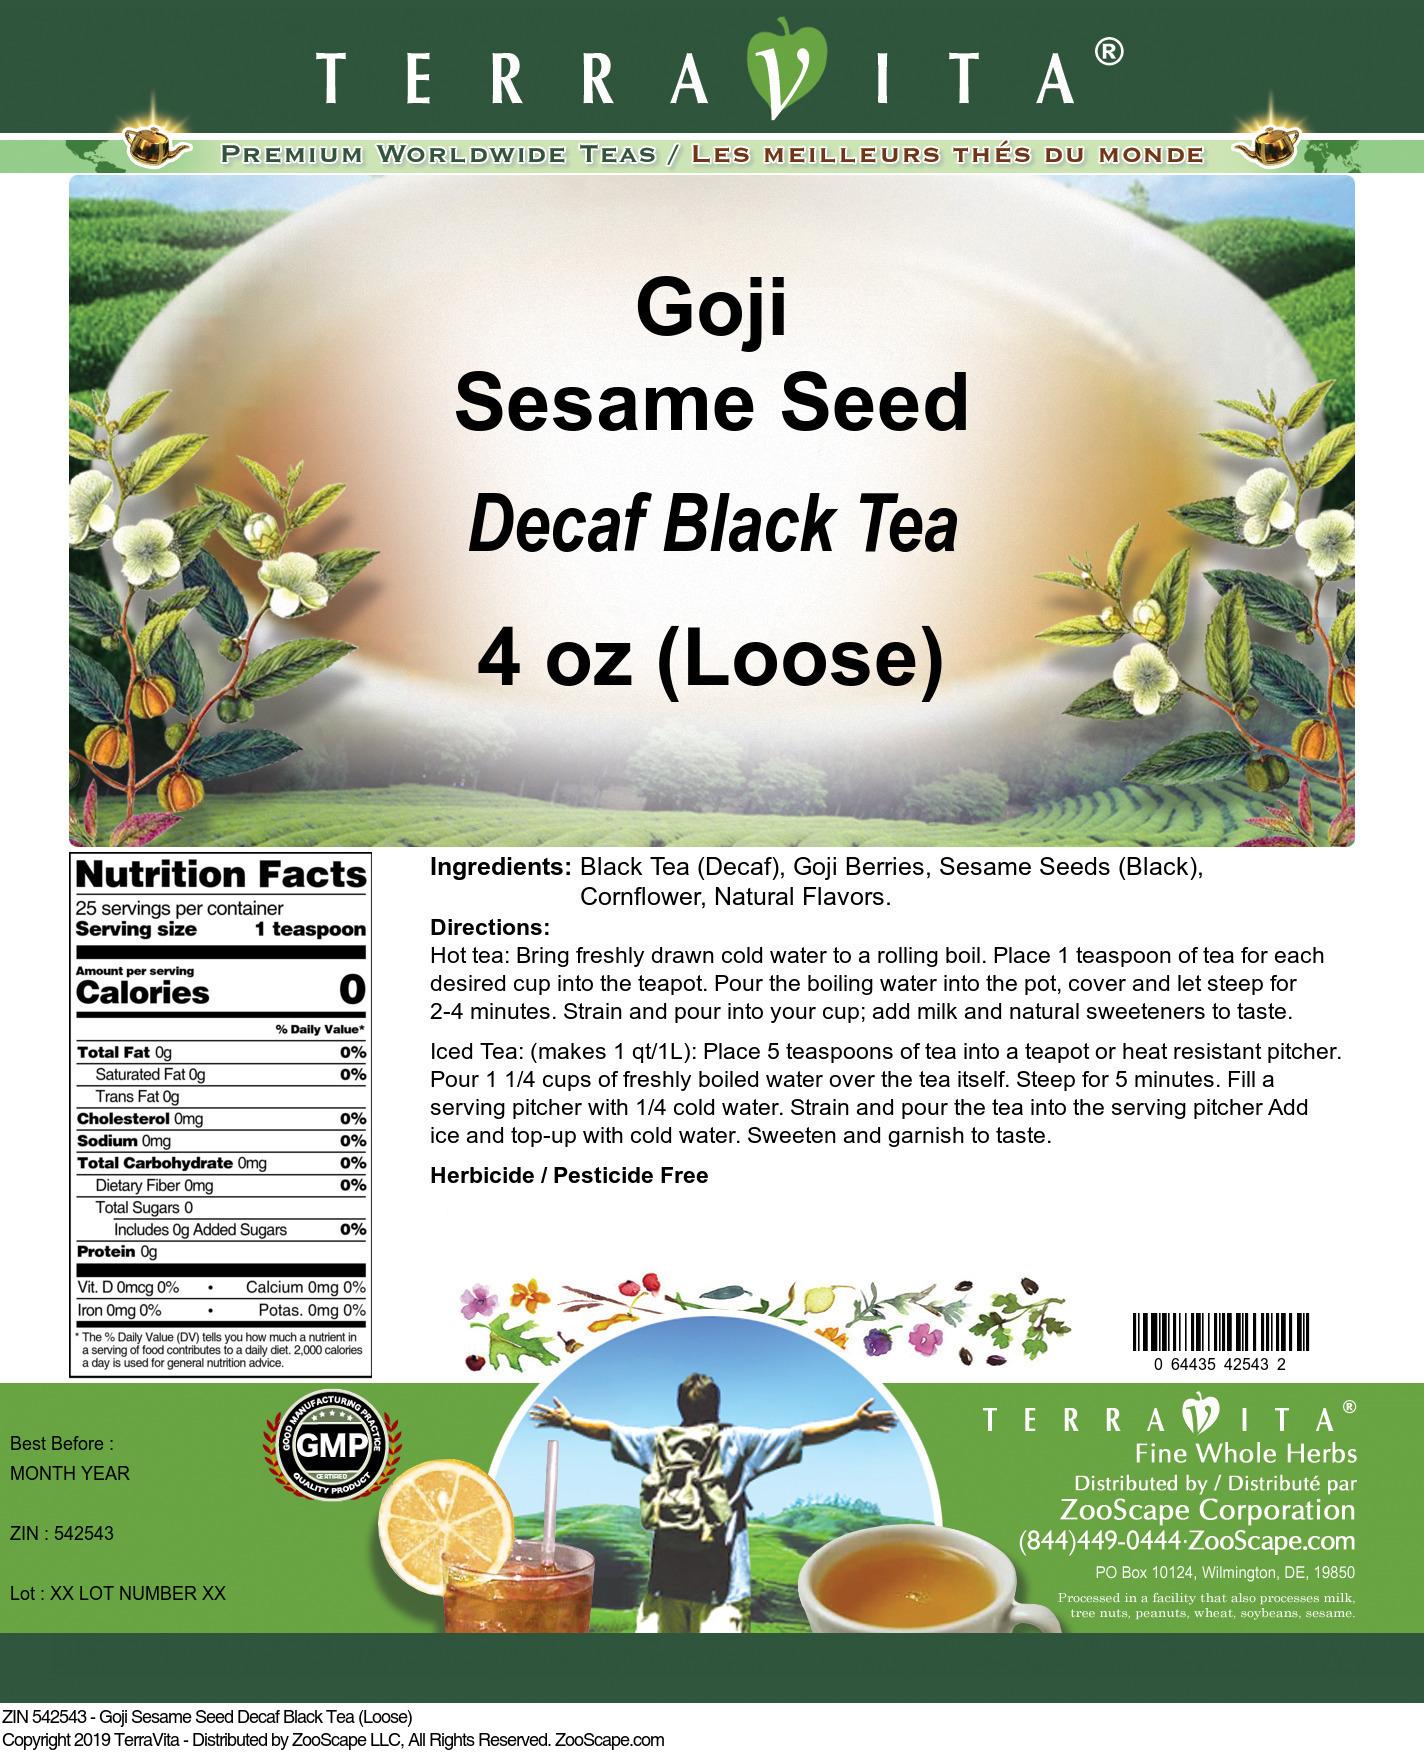 Goji Sesame Seed Decaf Black Tea